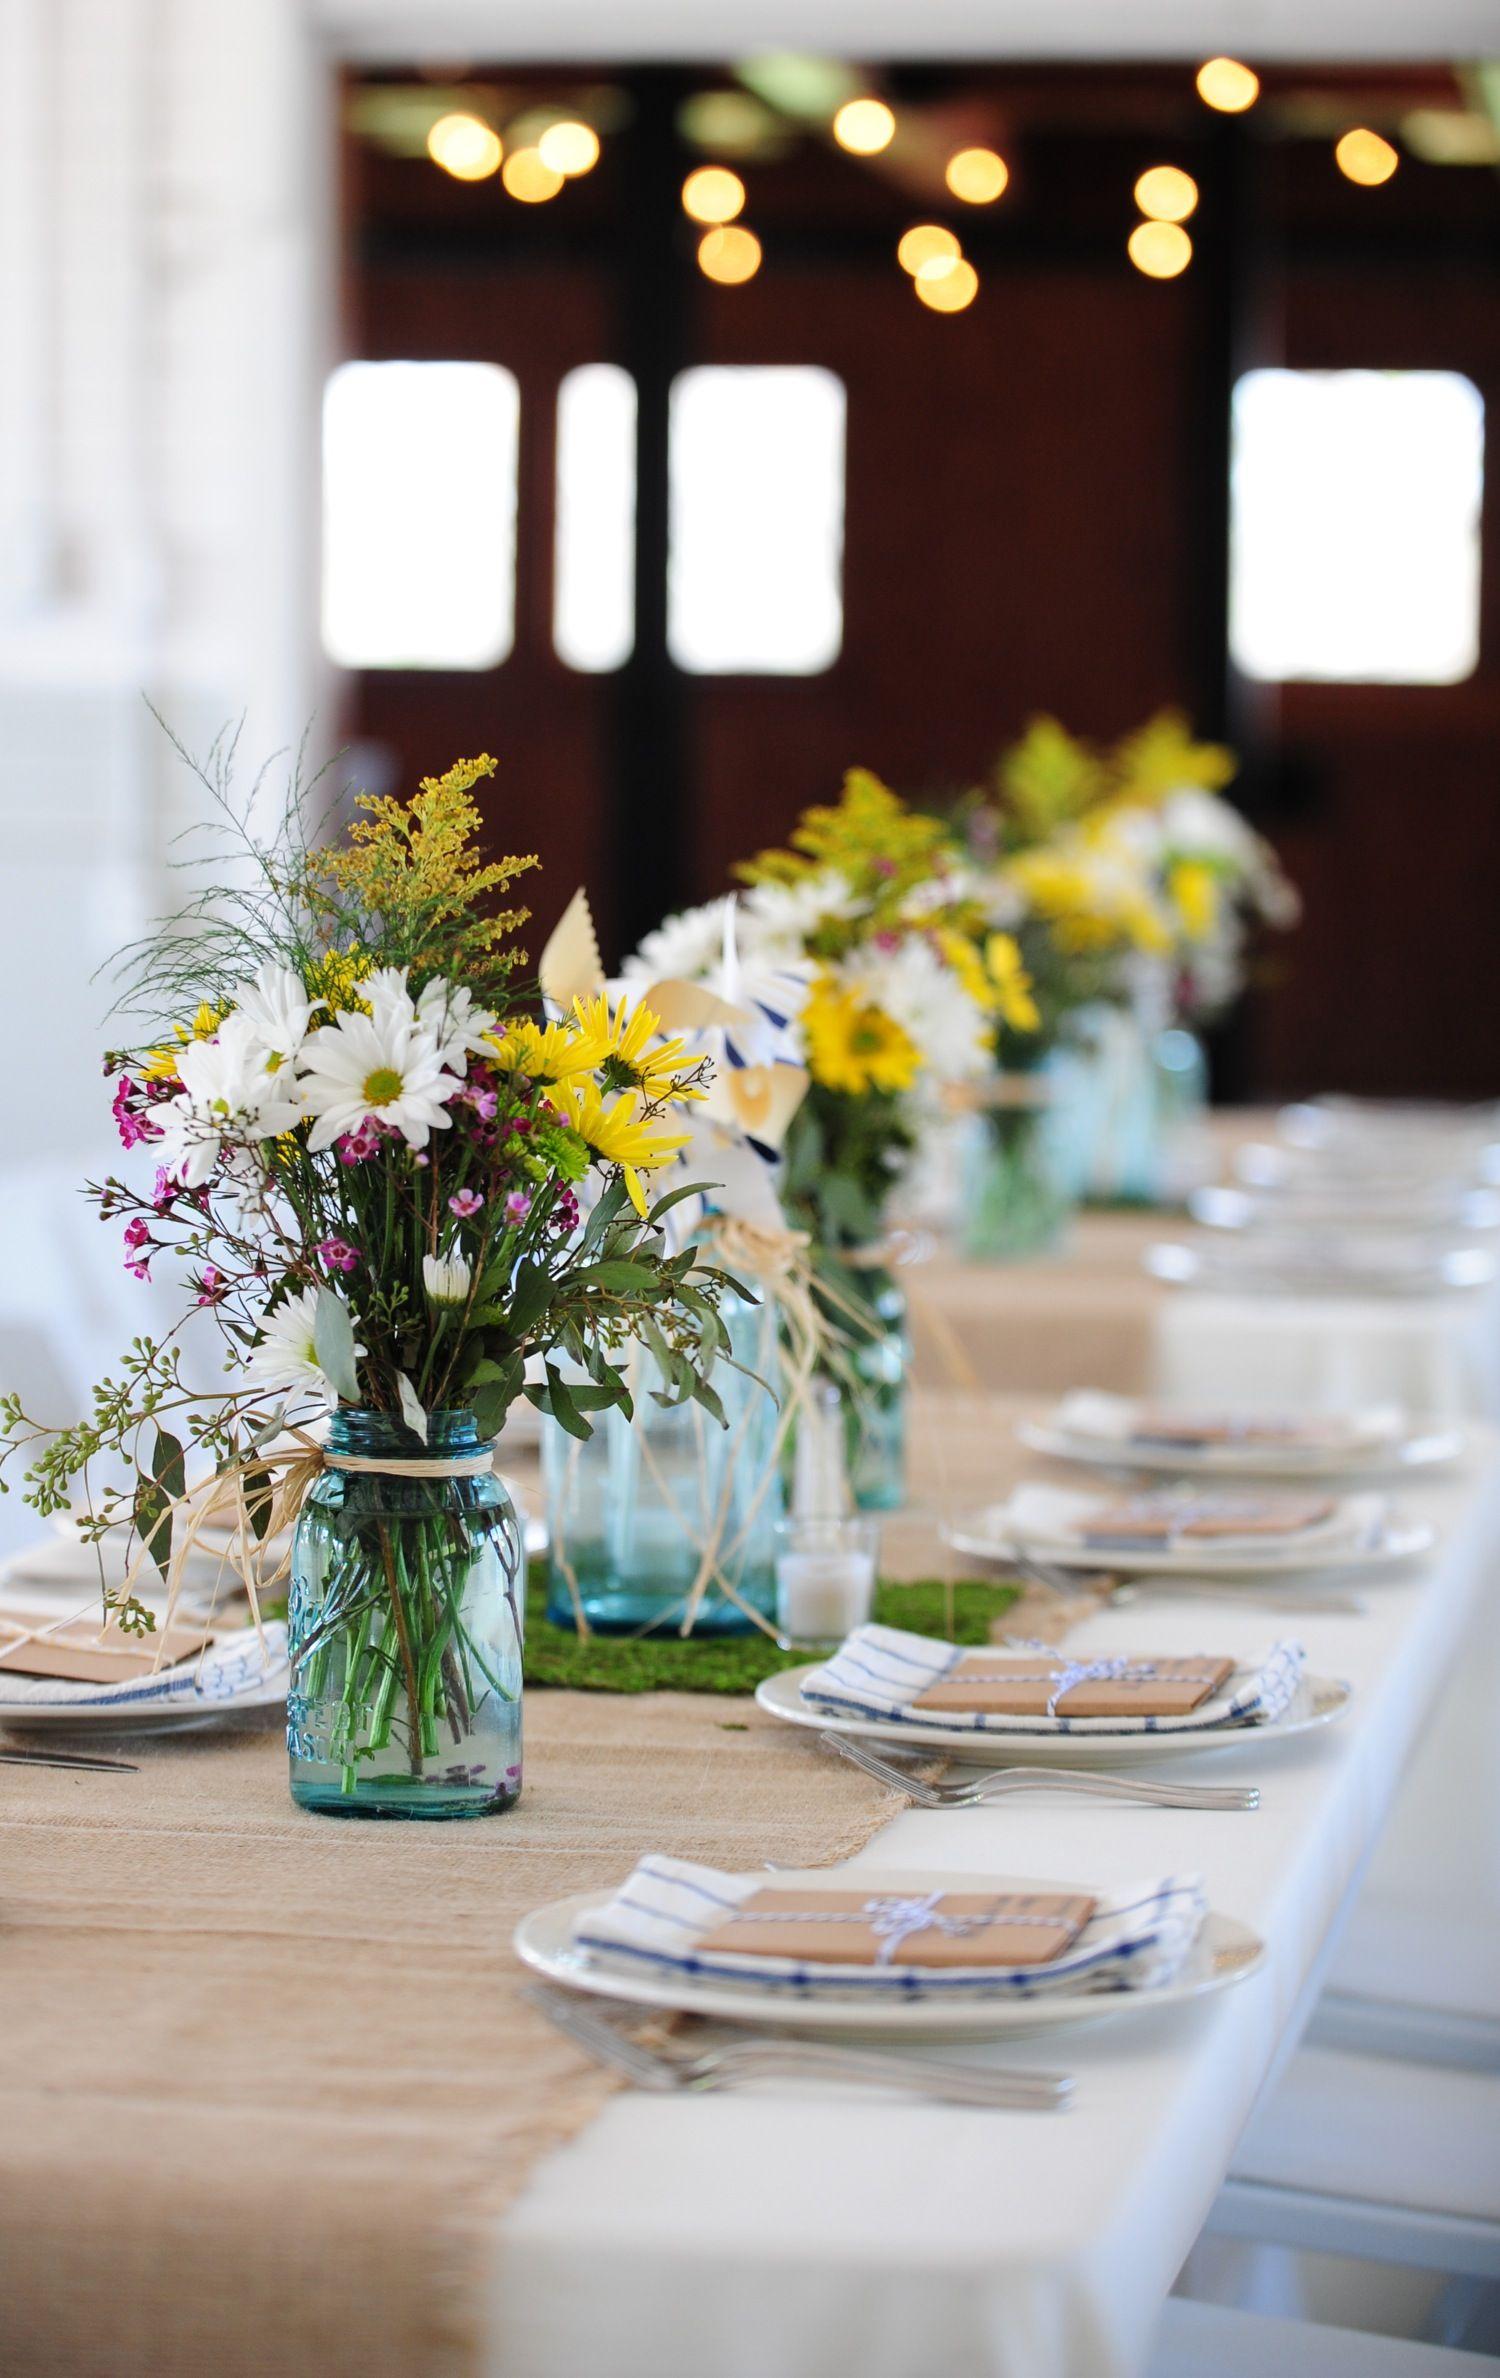 Rustic Wedding Centerpieces Mason Jars | ... wedding reception with  wildflower centerpieces in mason jars | OneWed